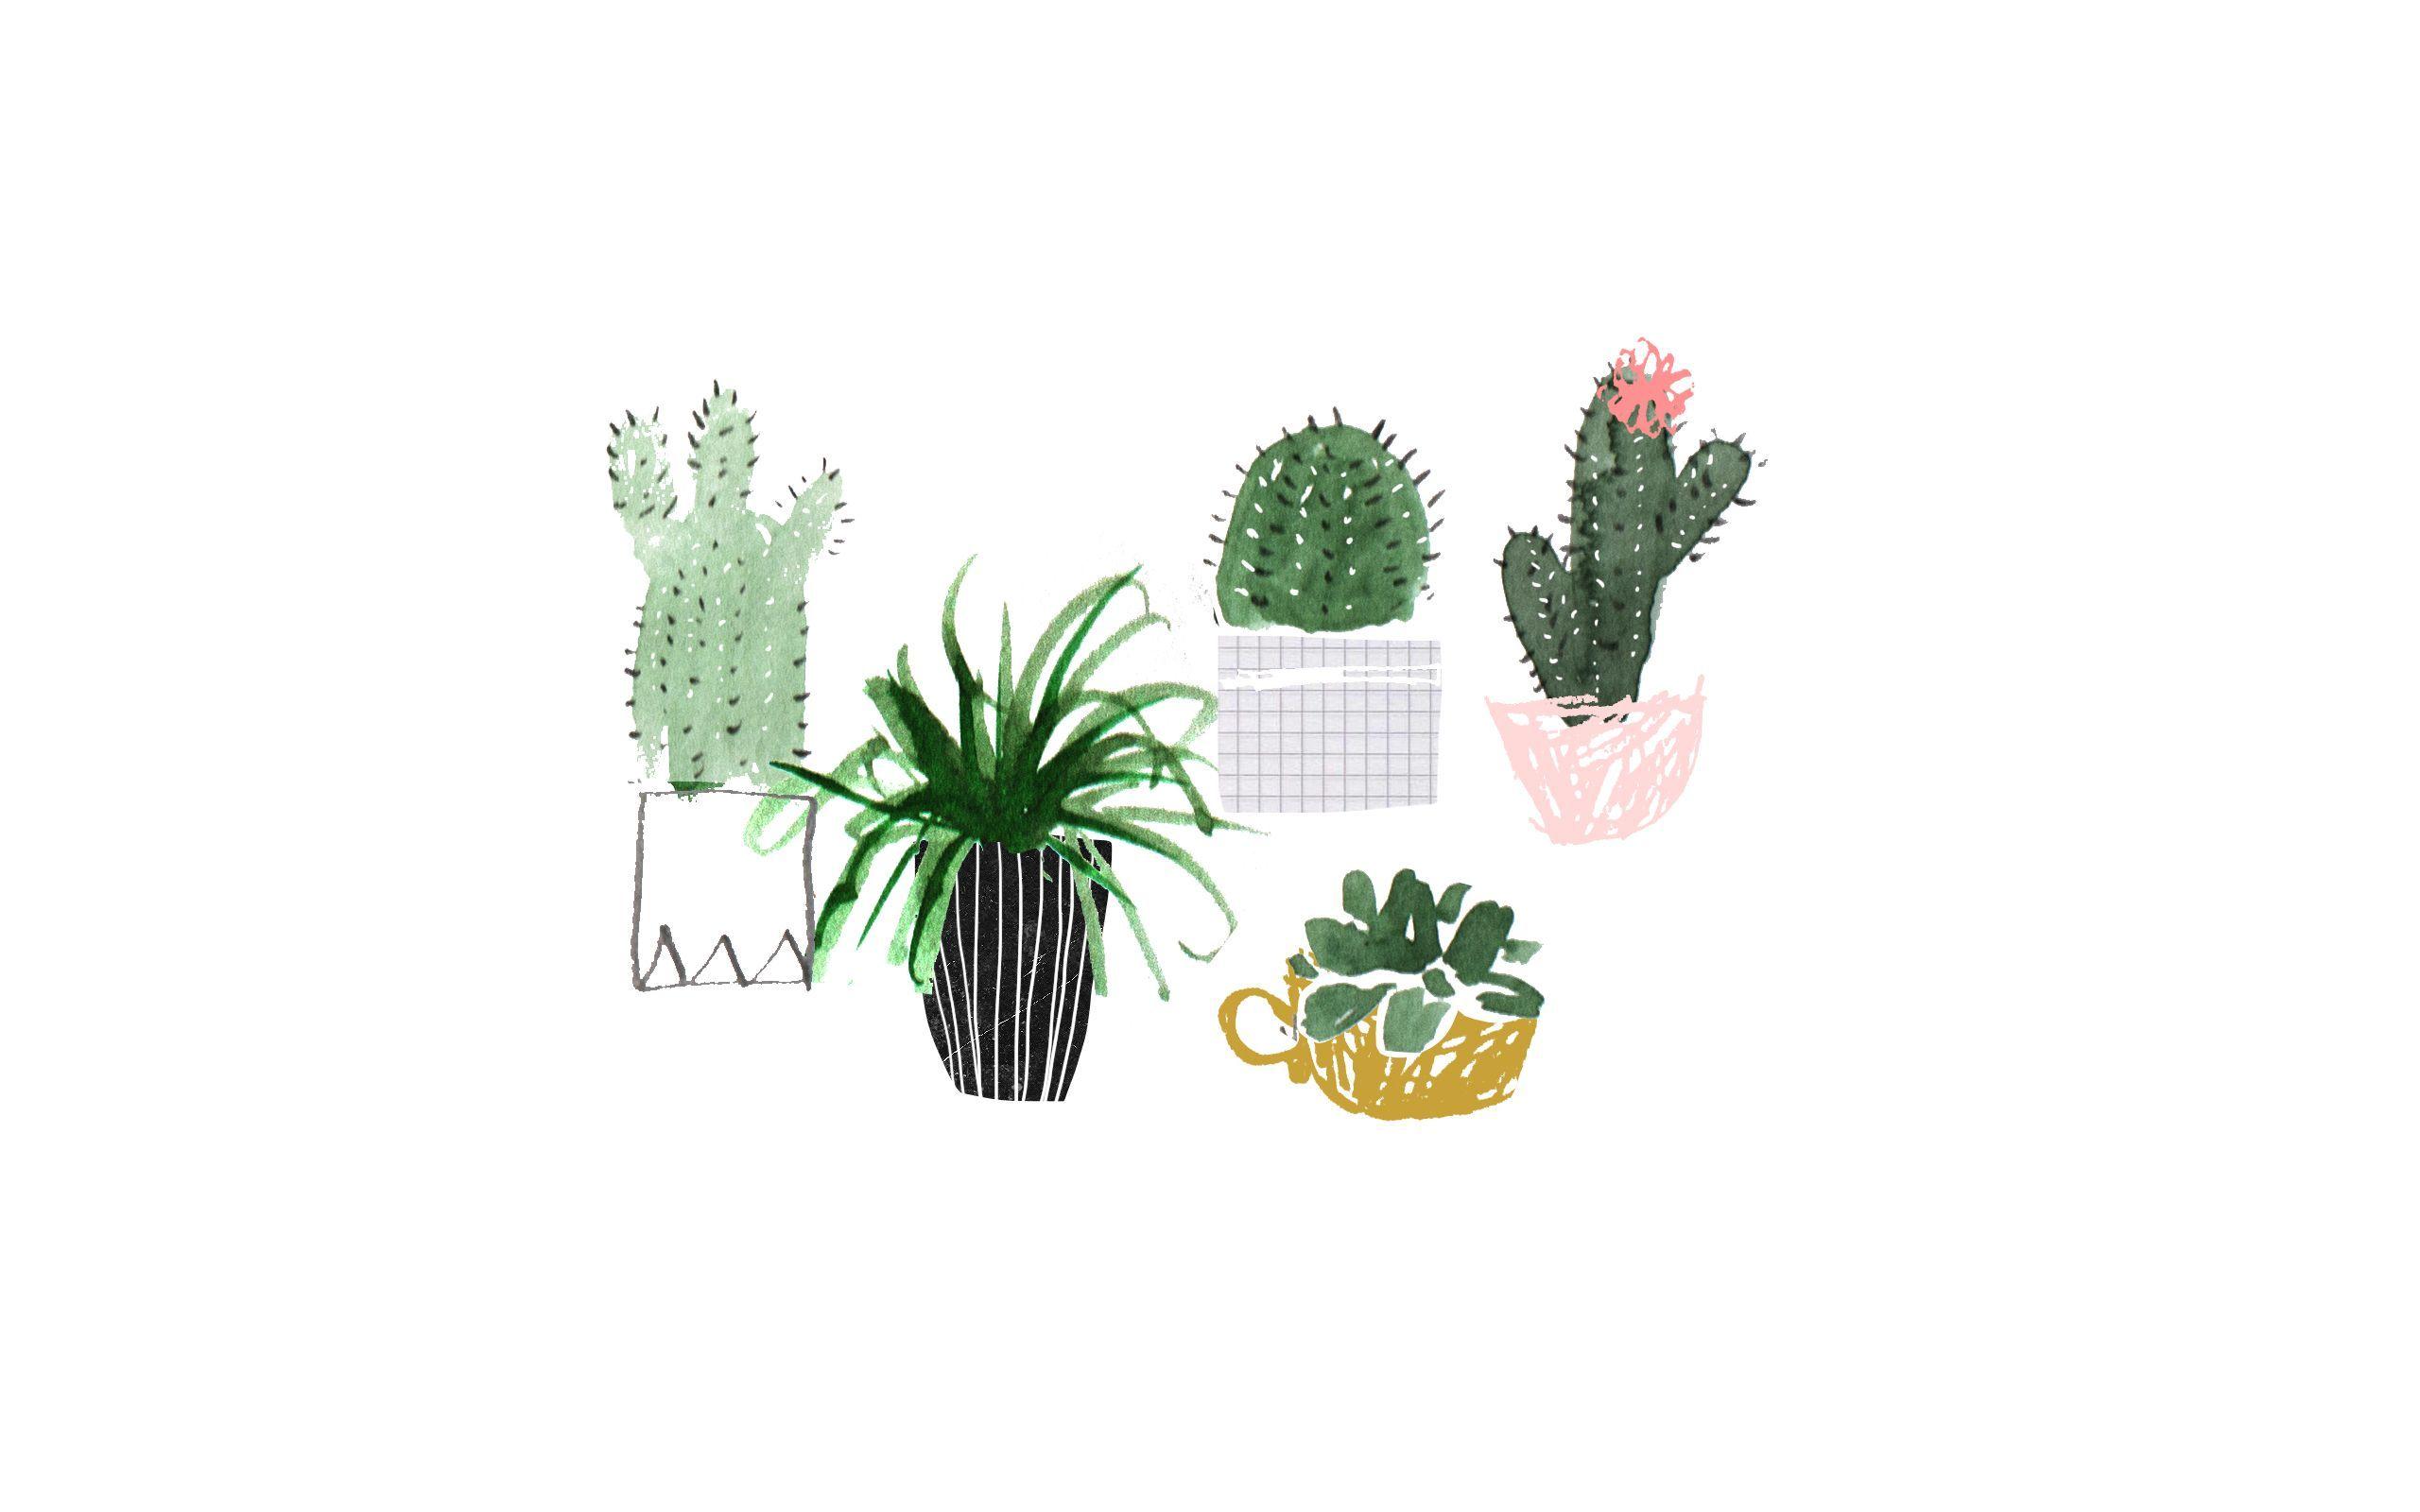 Cactus Wallpaper For Computer Watercolor Desktop Wallpaper Plant Wallpaper Pastel Background